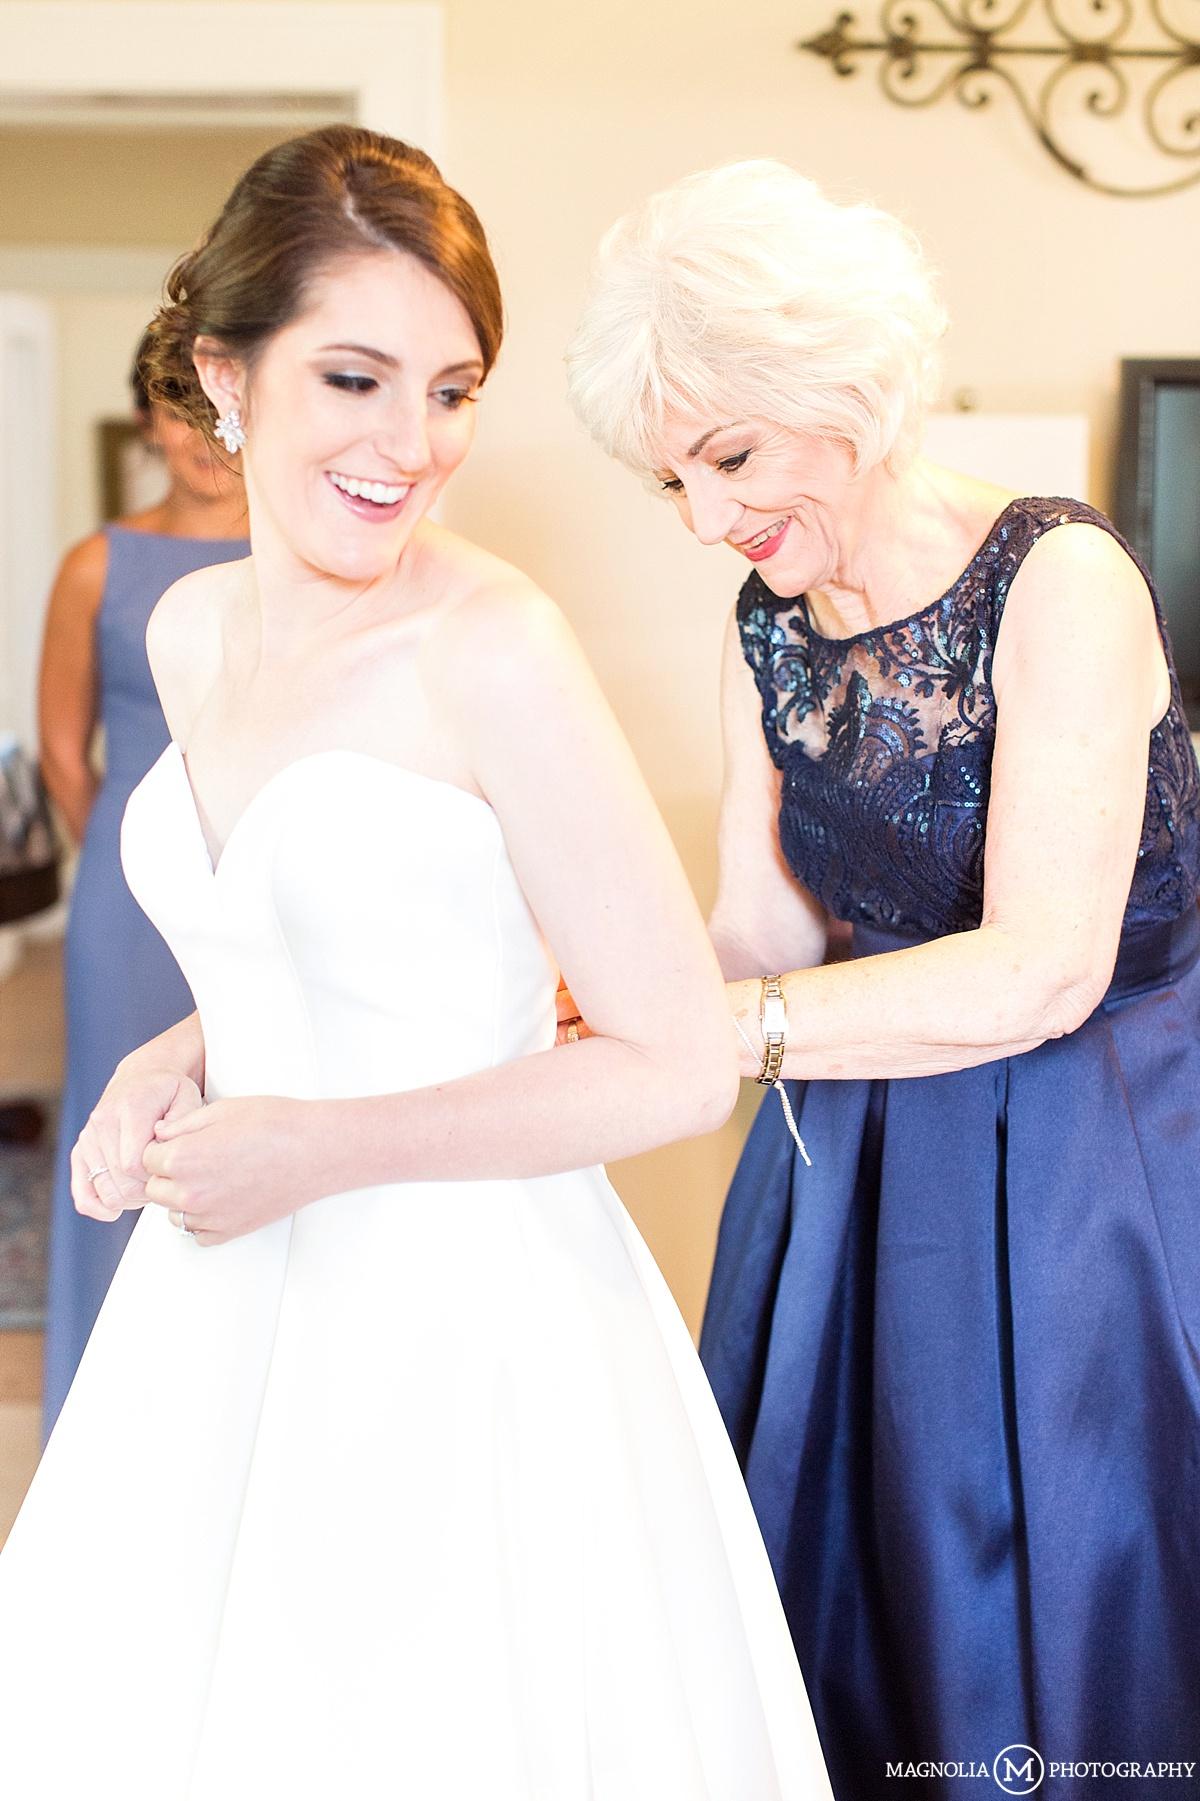 Mom Helping Daughter Into Wedding Dress